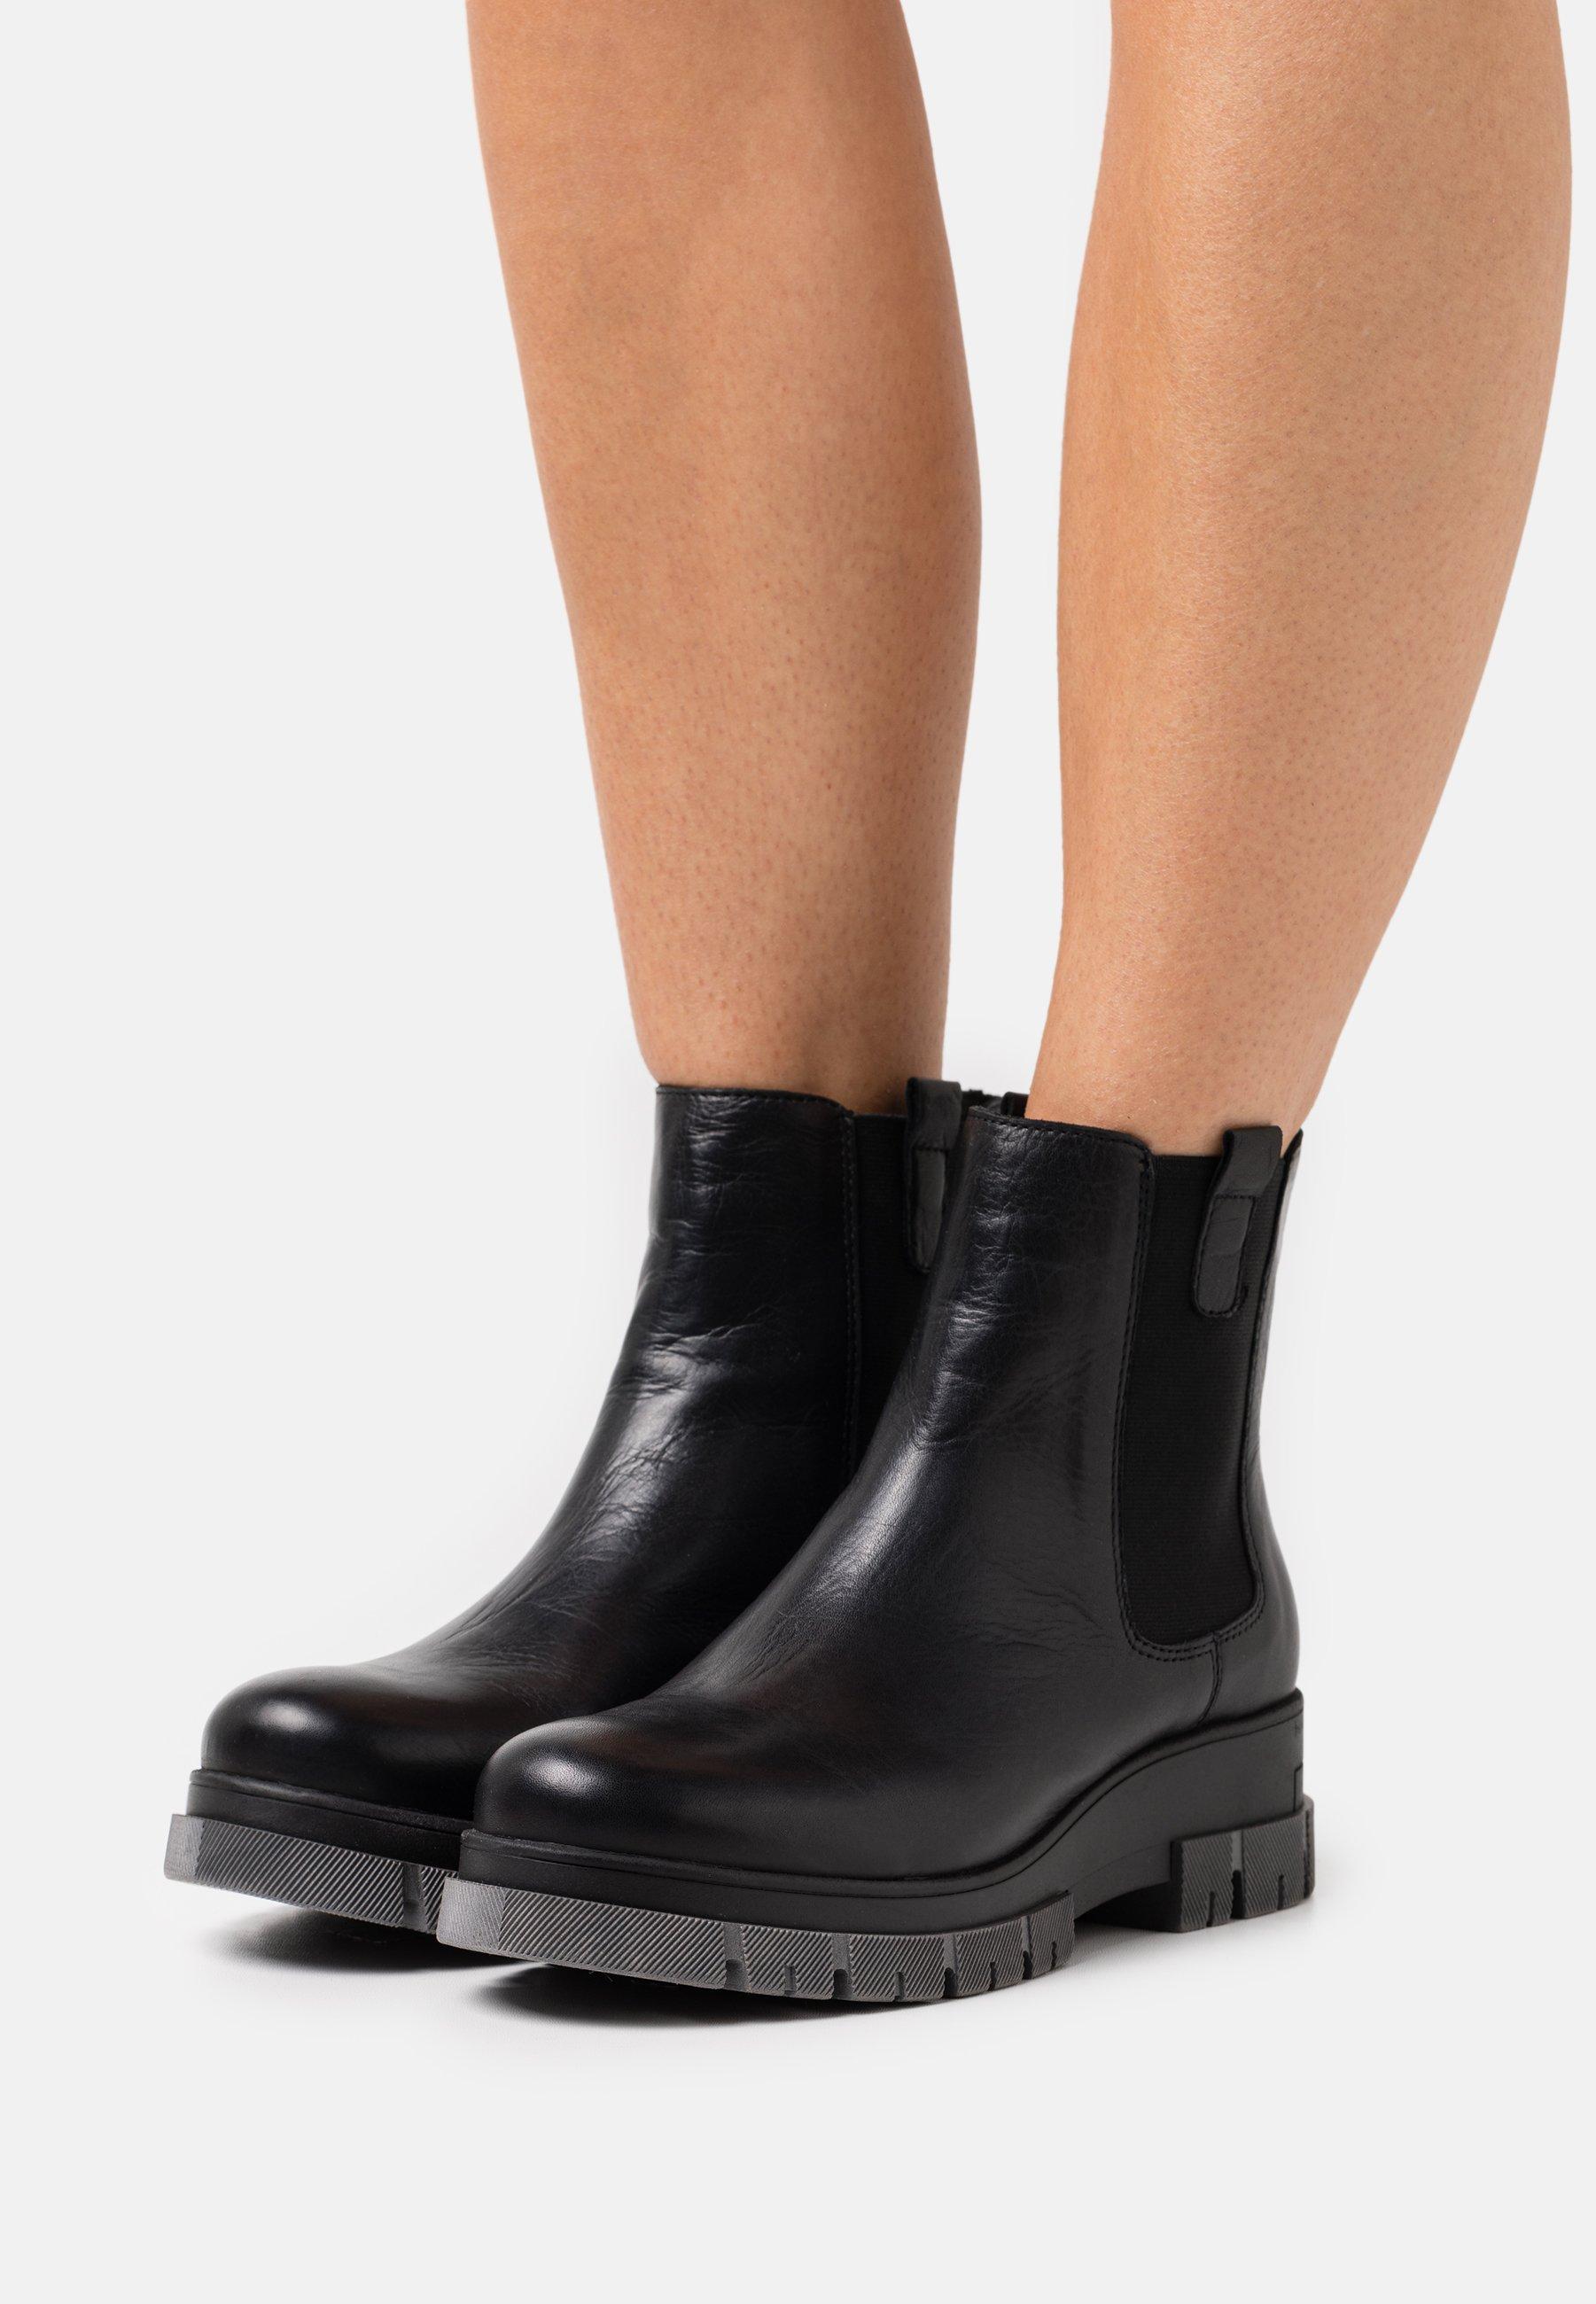 Women BIADEVINA SHORT CHELSEA BOOT - Platform ankle boots - black